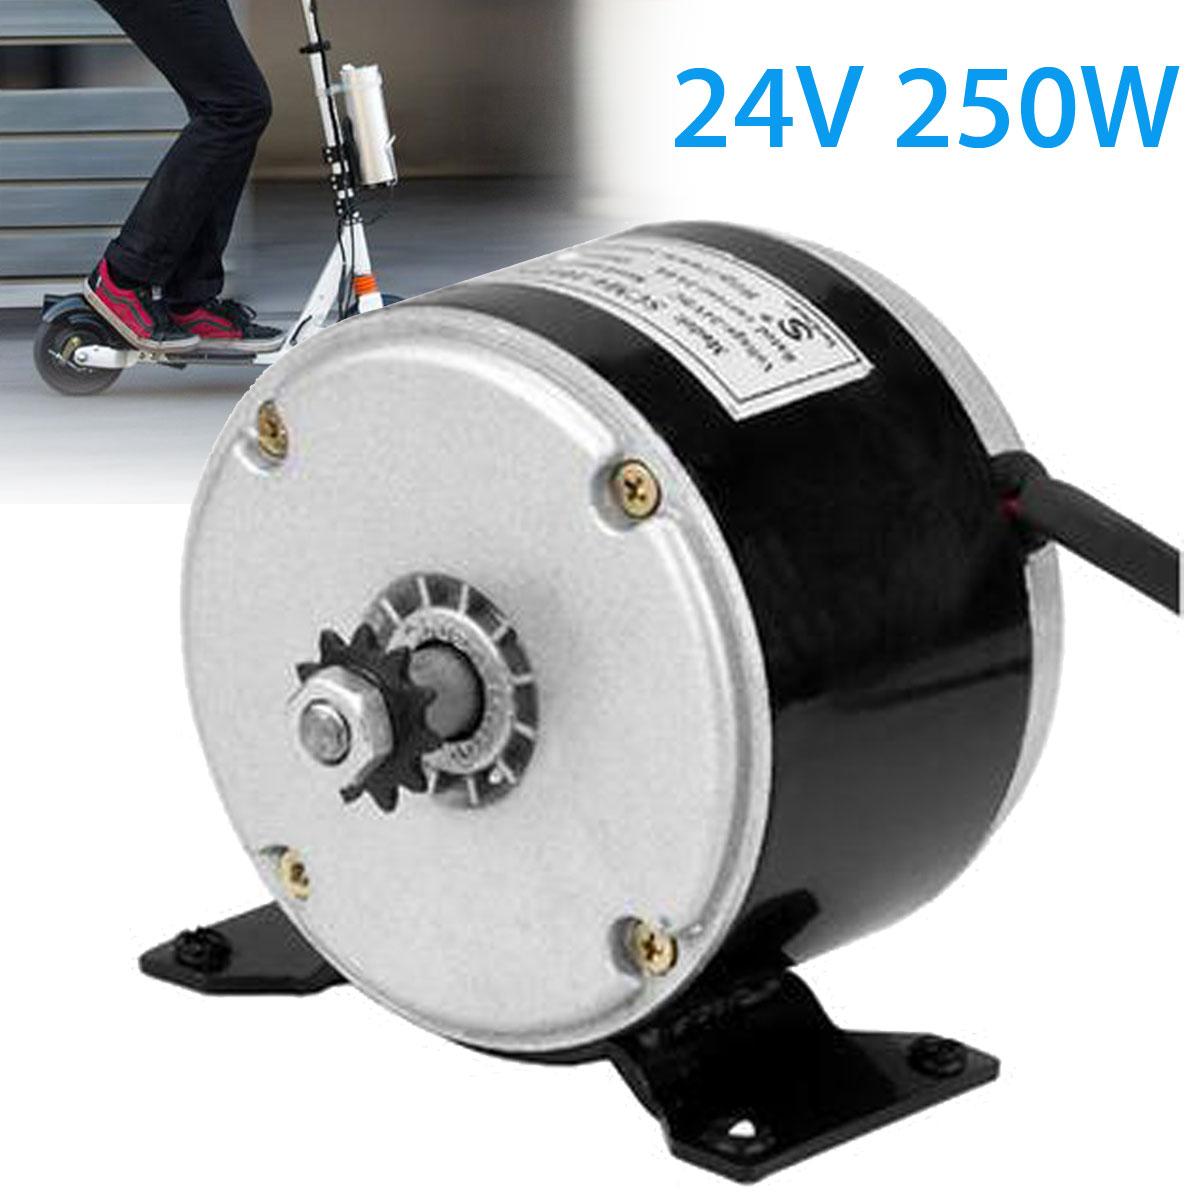 DC 24V 250W Permanent Magnet Motor Generator Wind Turbine Micro Motor